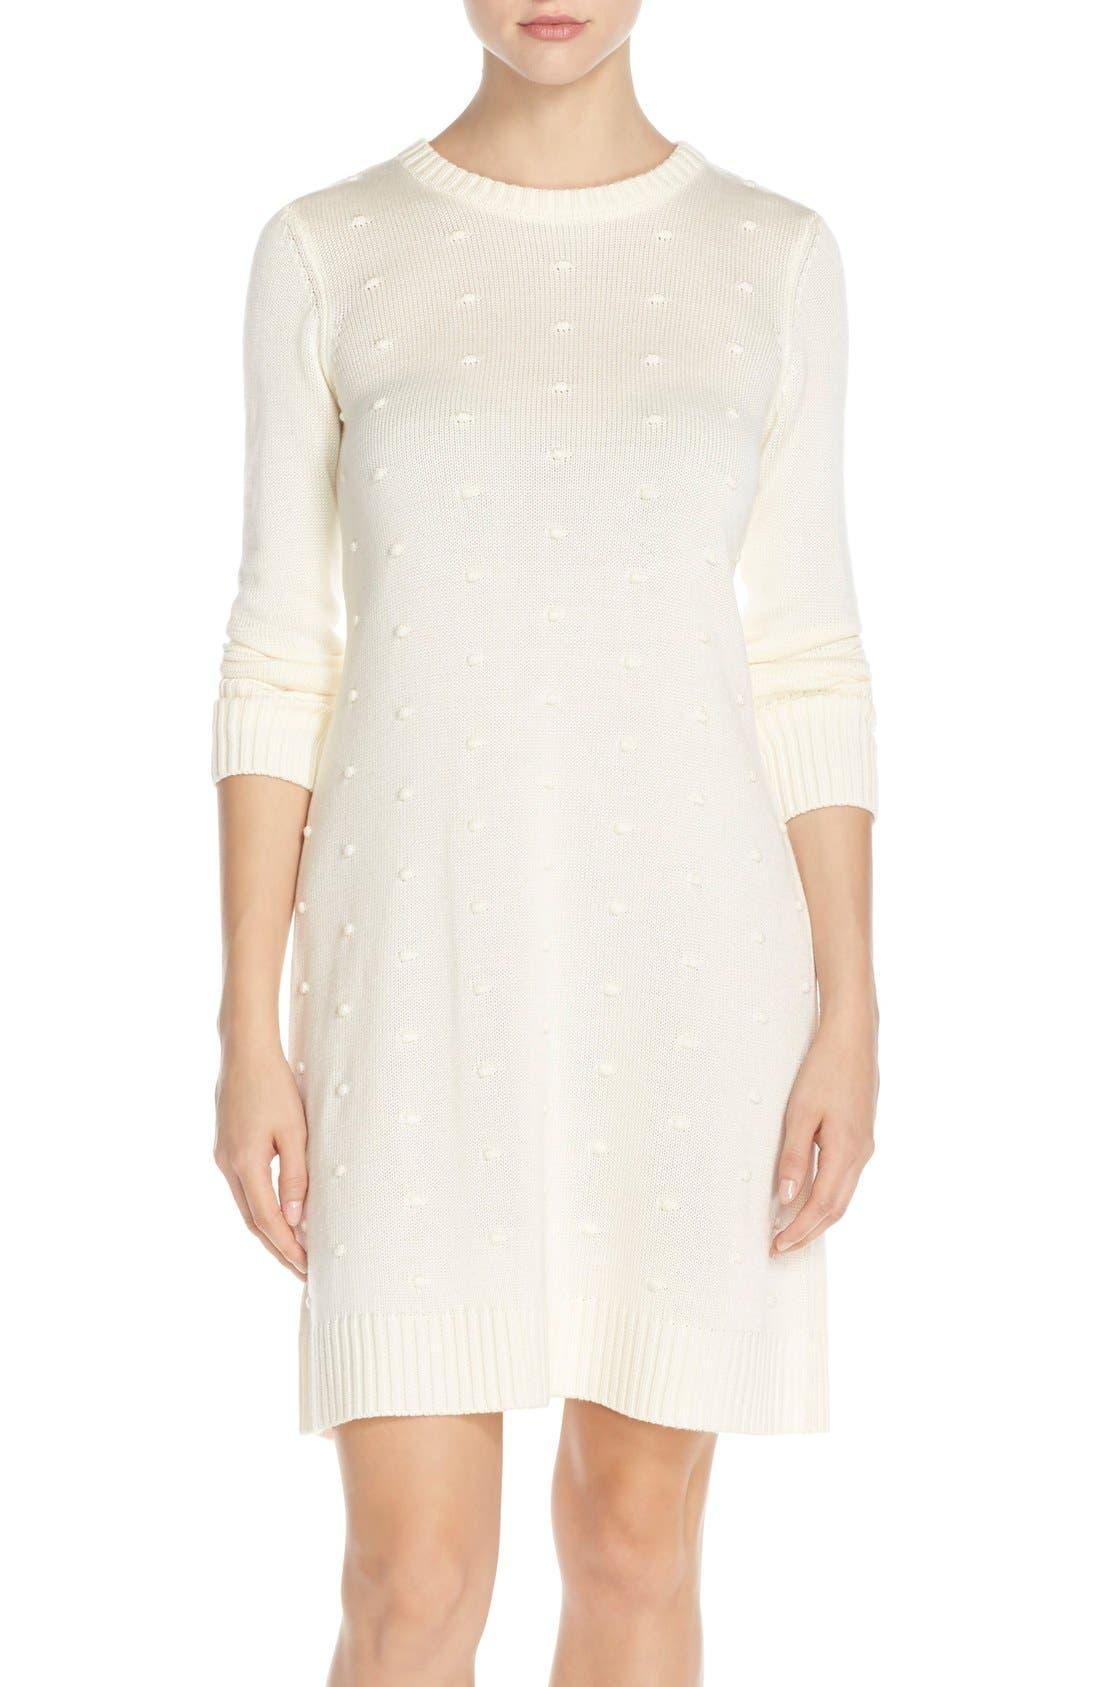 Main Image - Eliza J NubbyKnit Shift Sweater Dress